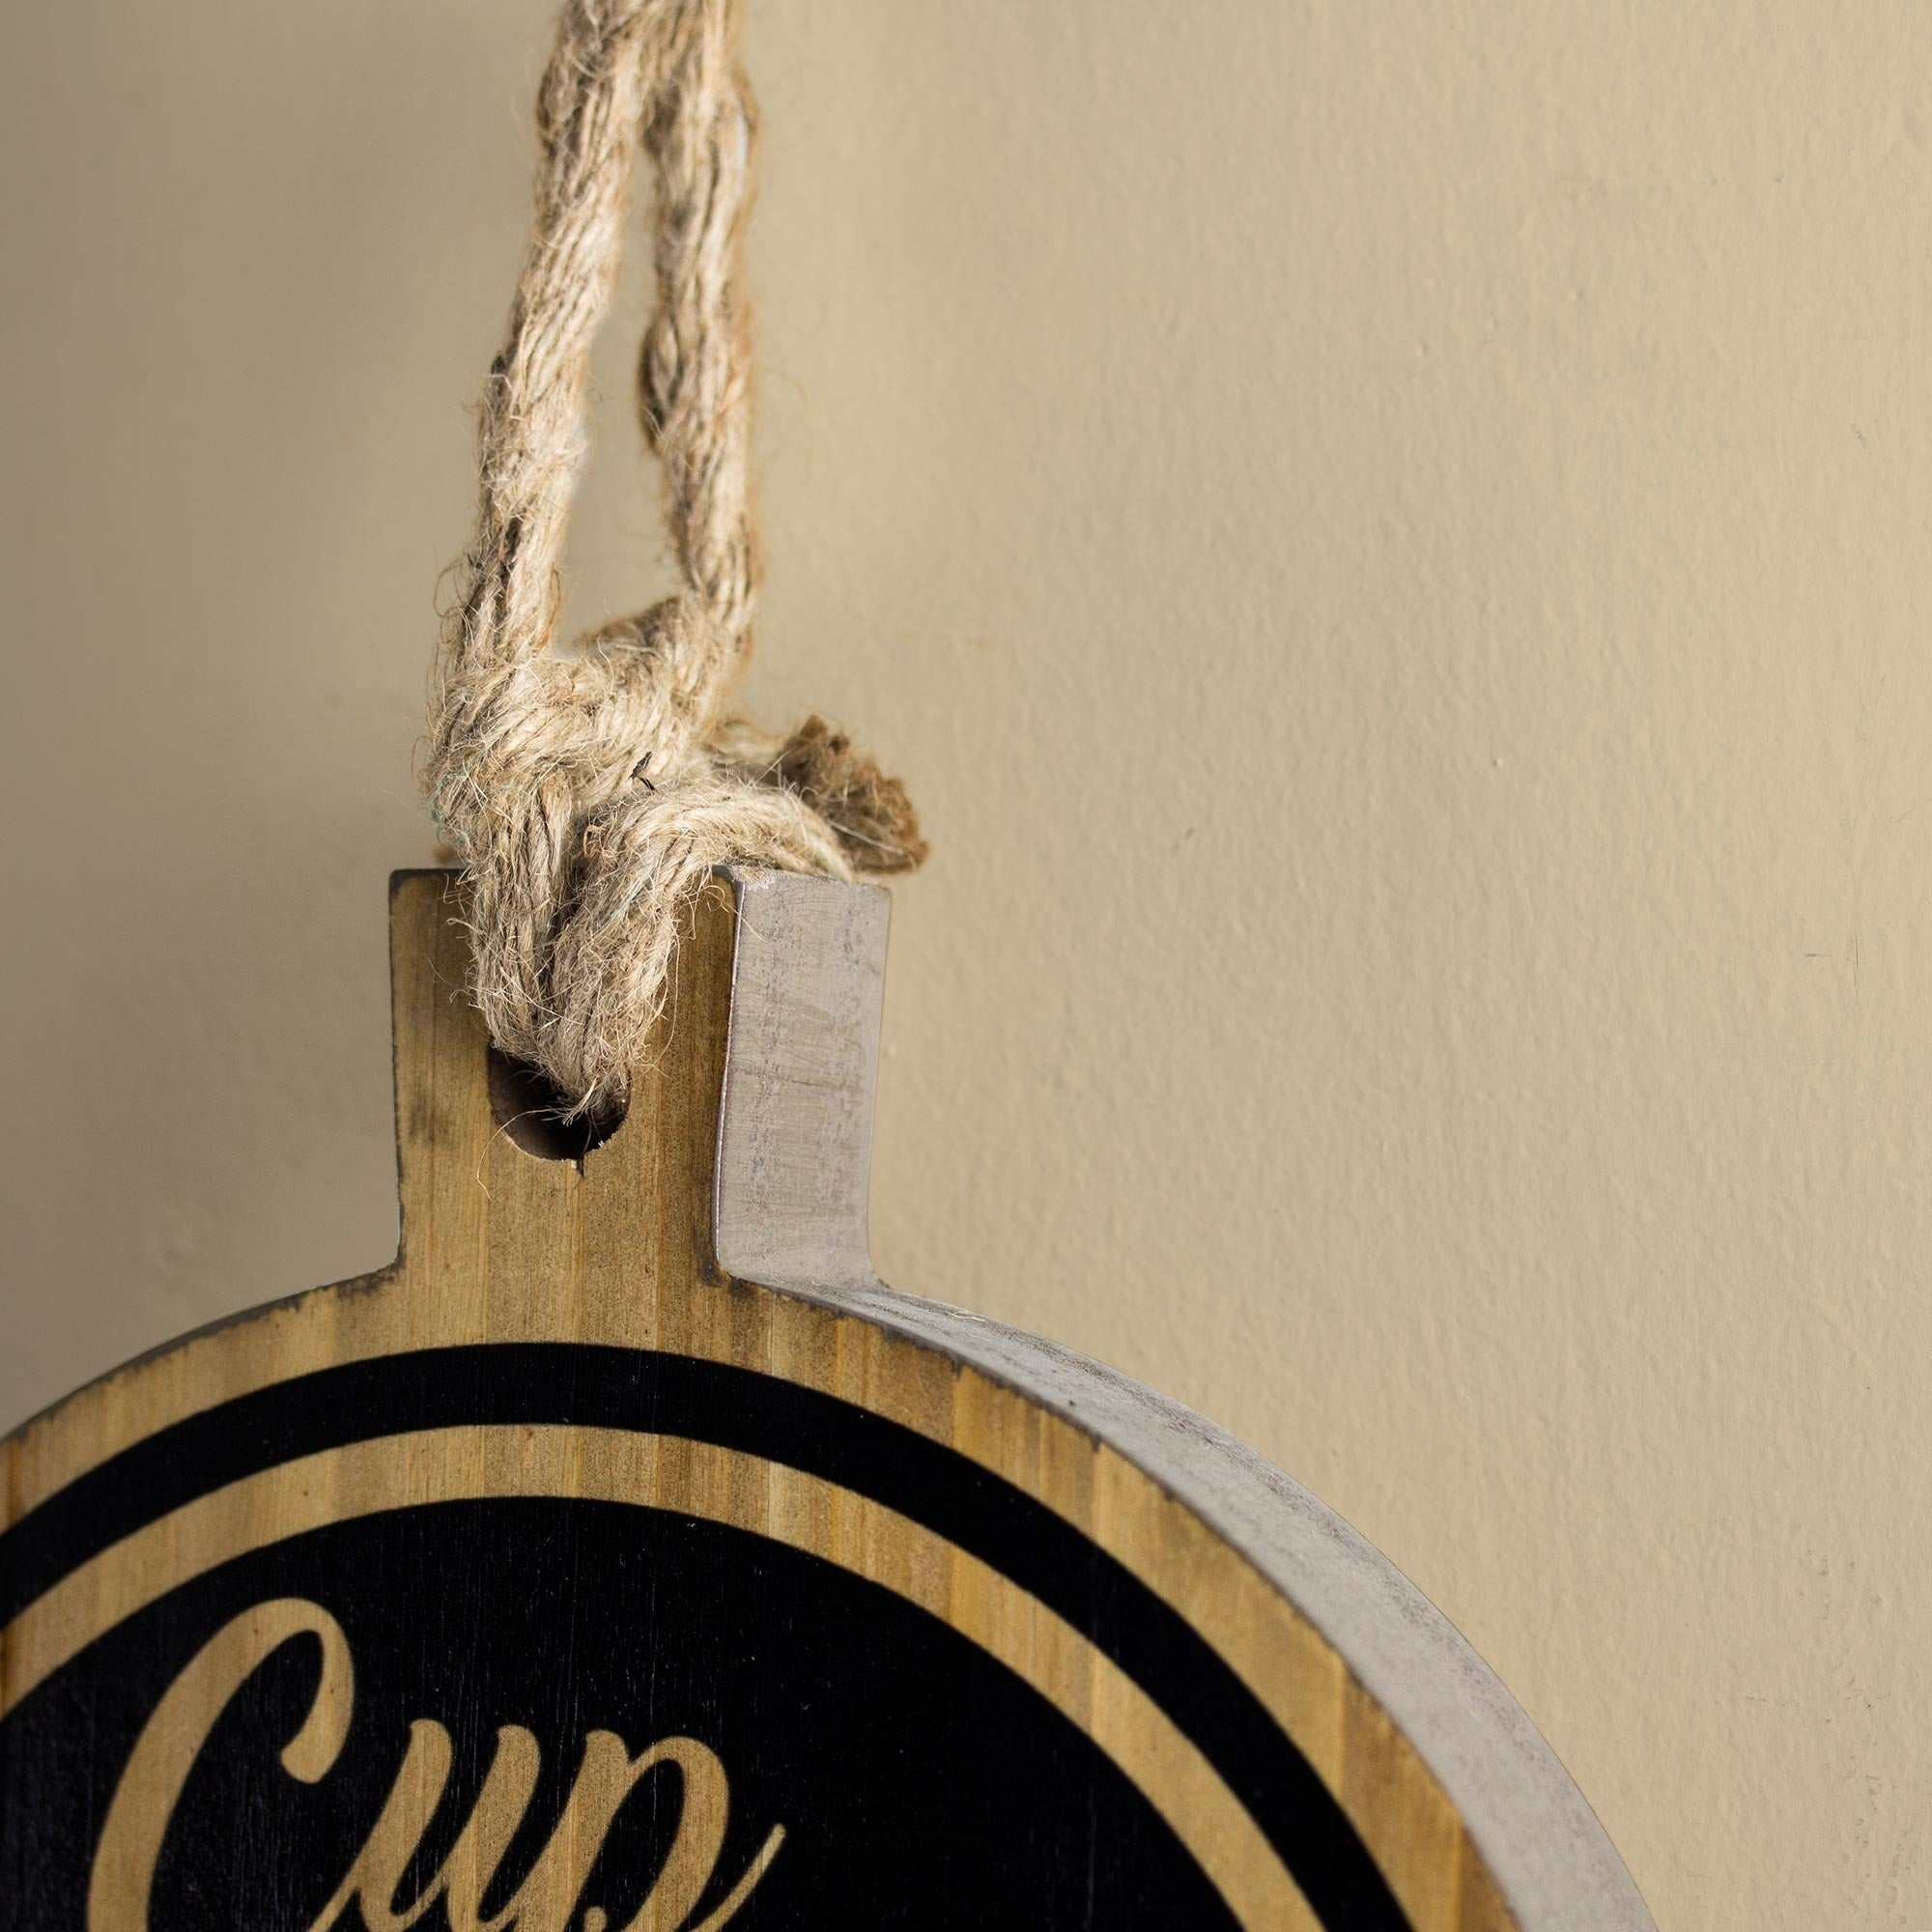 Shop American Art Decor Cup Of Joe Wood Coffee Wall Decor – Free In 2019 Cup Of Joe Wall Decor (Gallery 15 of 20)